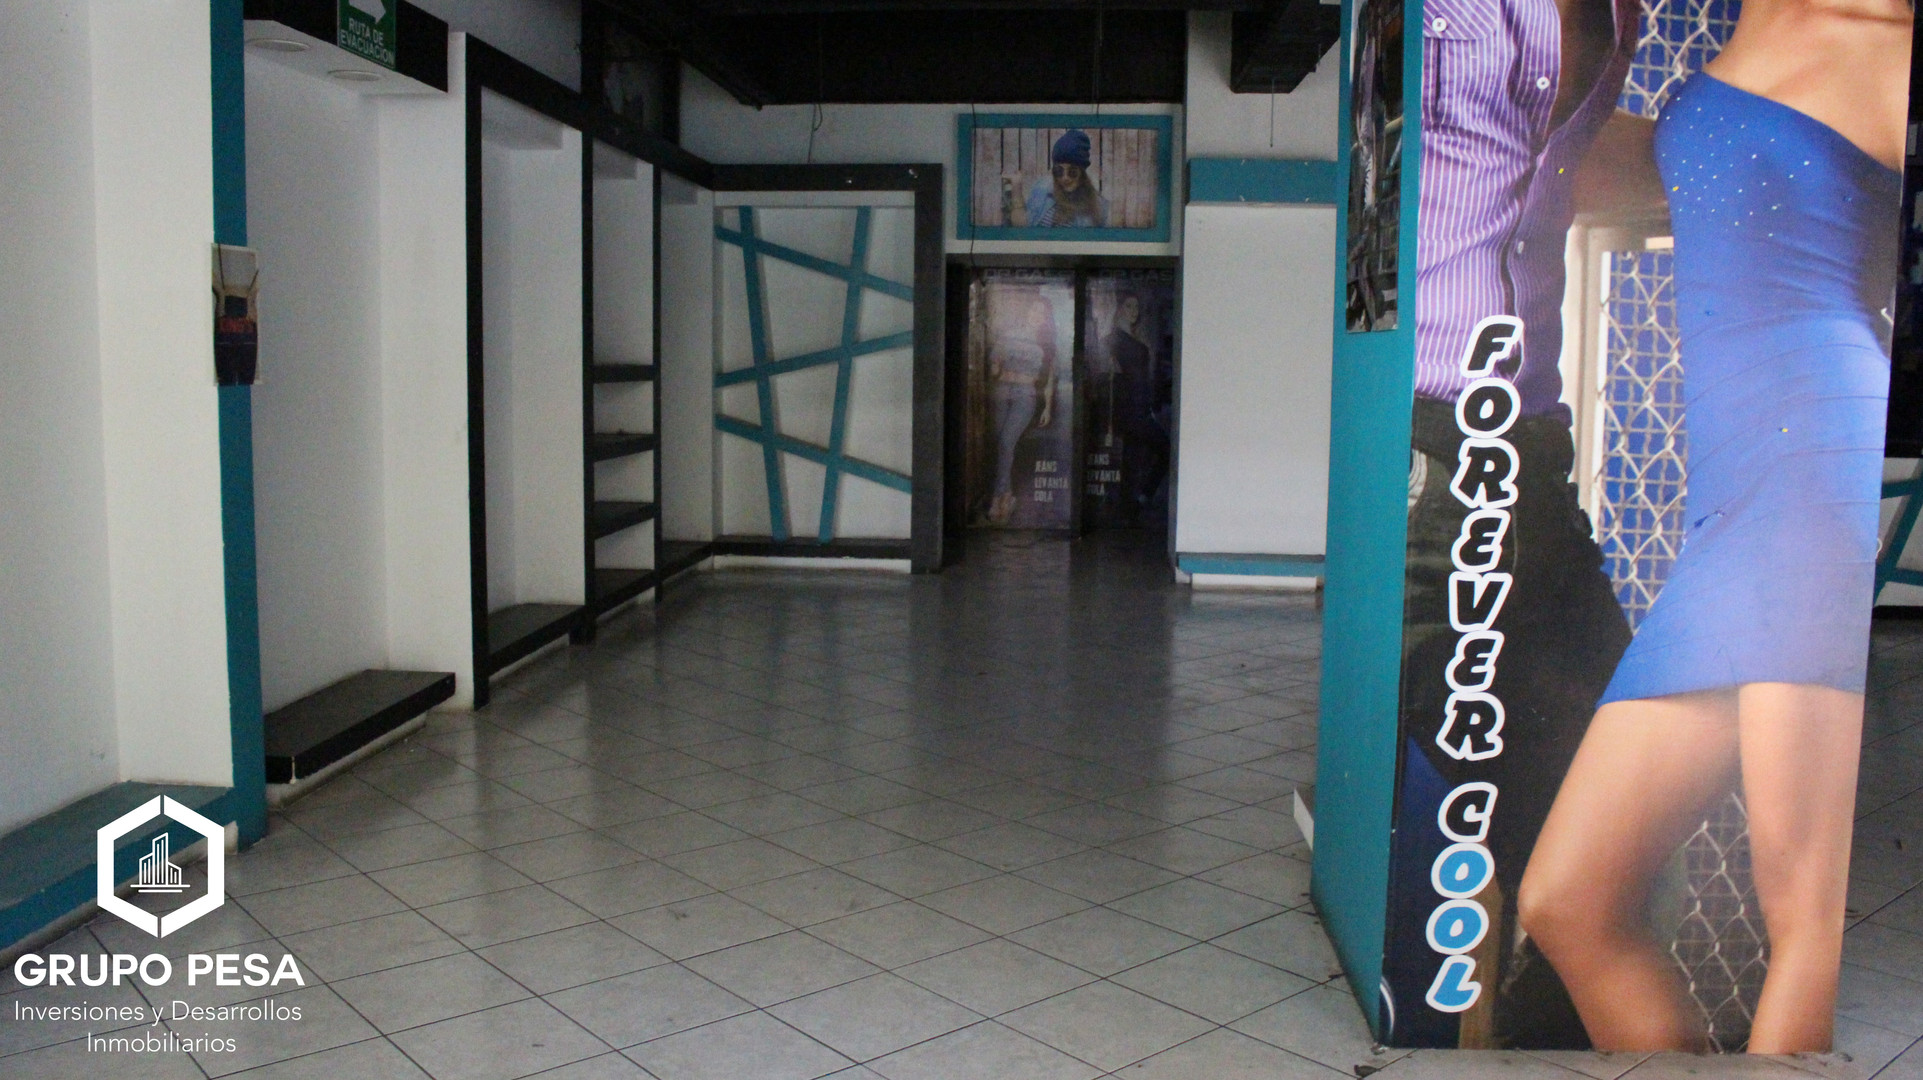 Local Comercial | C.C. Próceres, Zona 10| Cd. de Guatemala